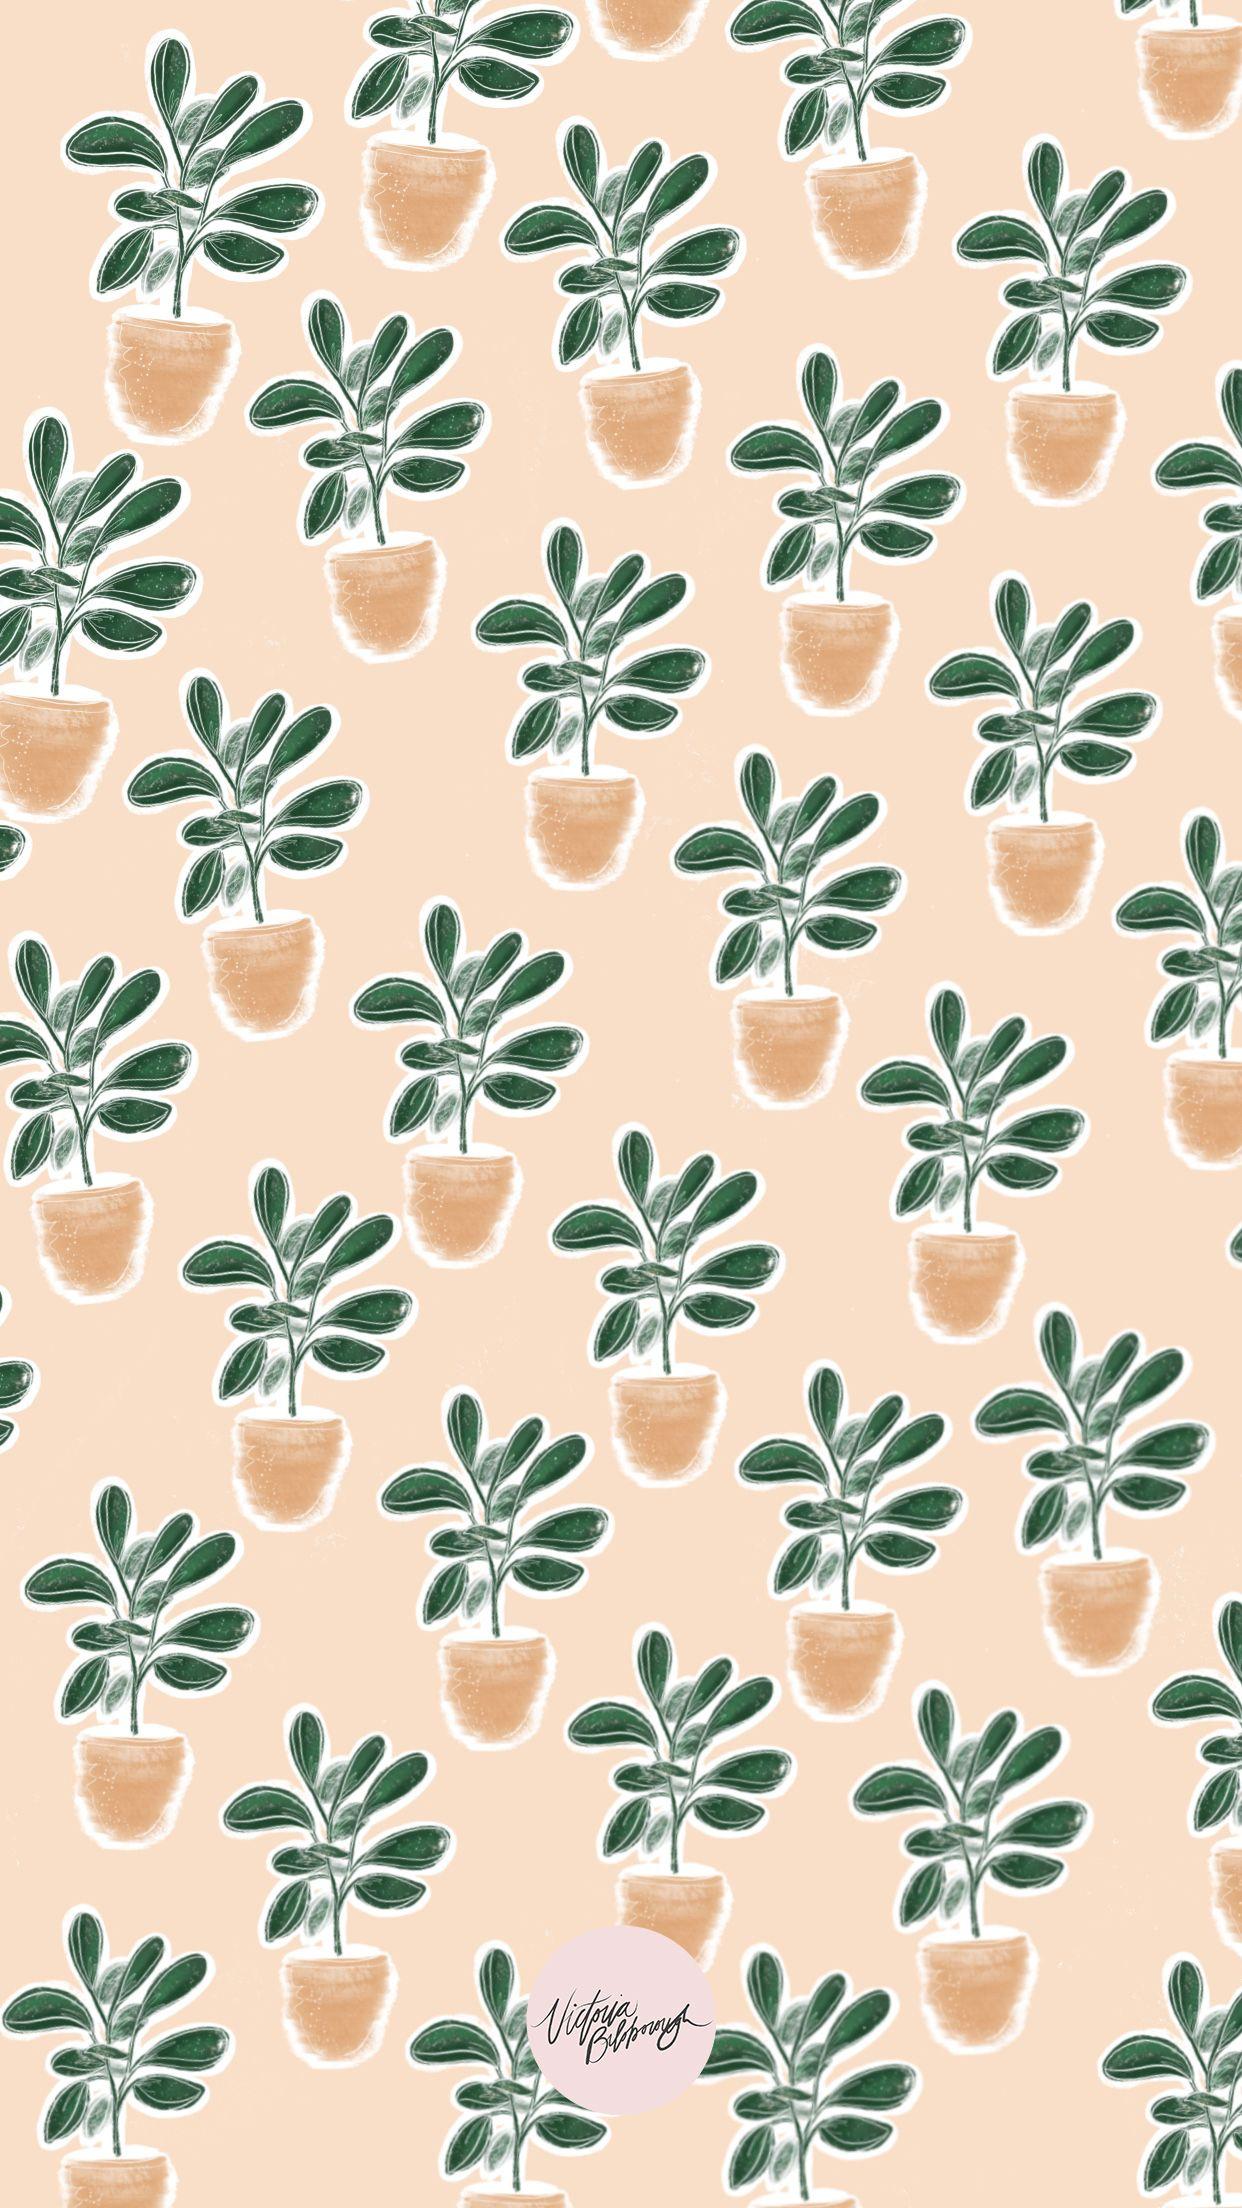 Fiddle Leaf Wallpaper By Victoria Bilsborough Wallpaper In 2019